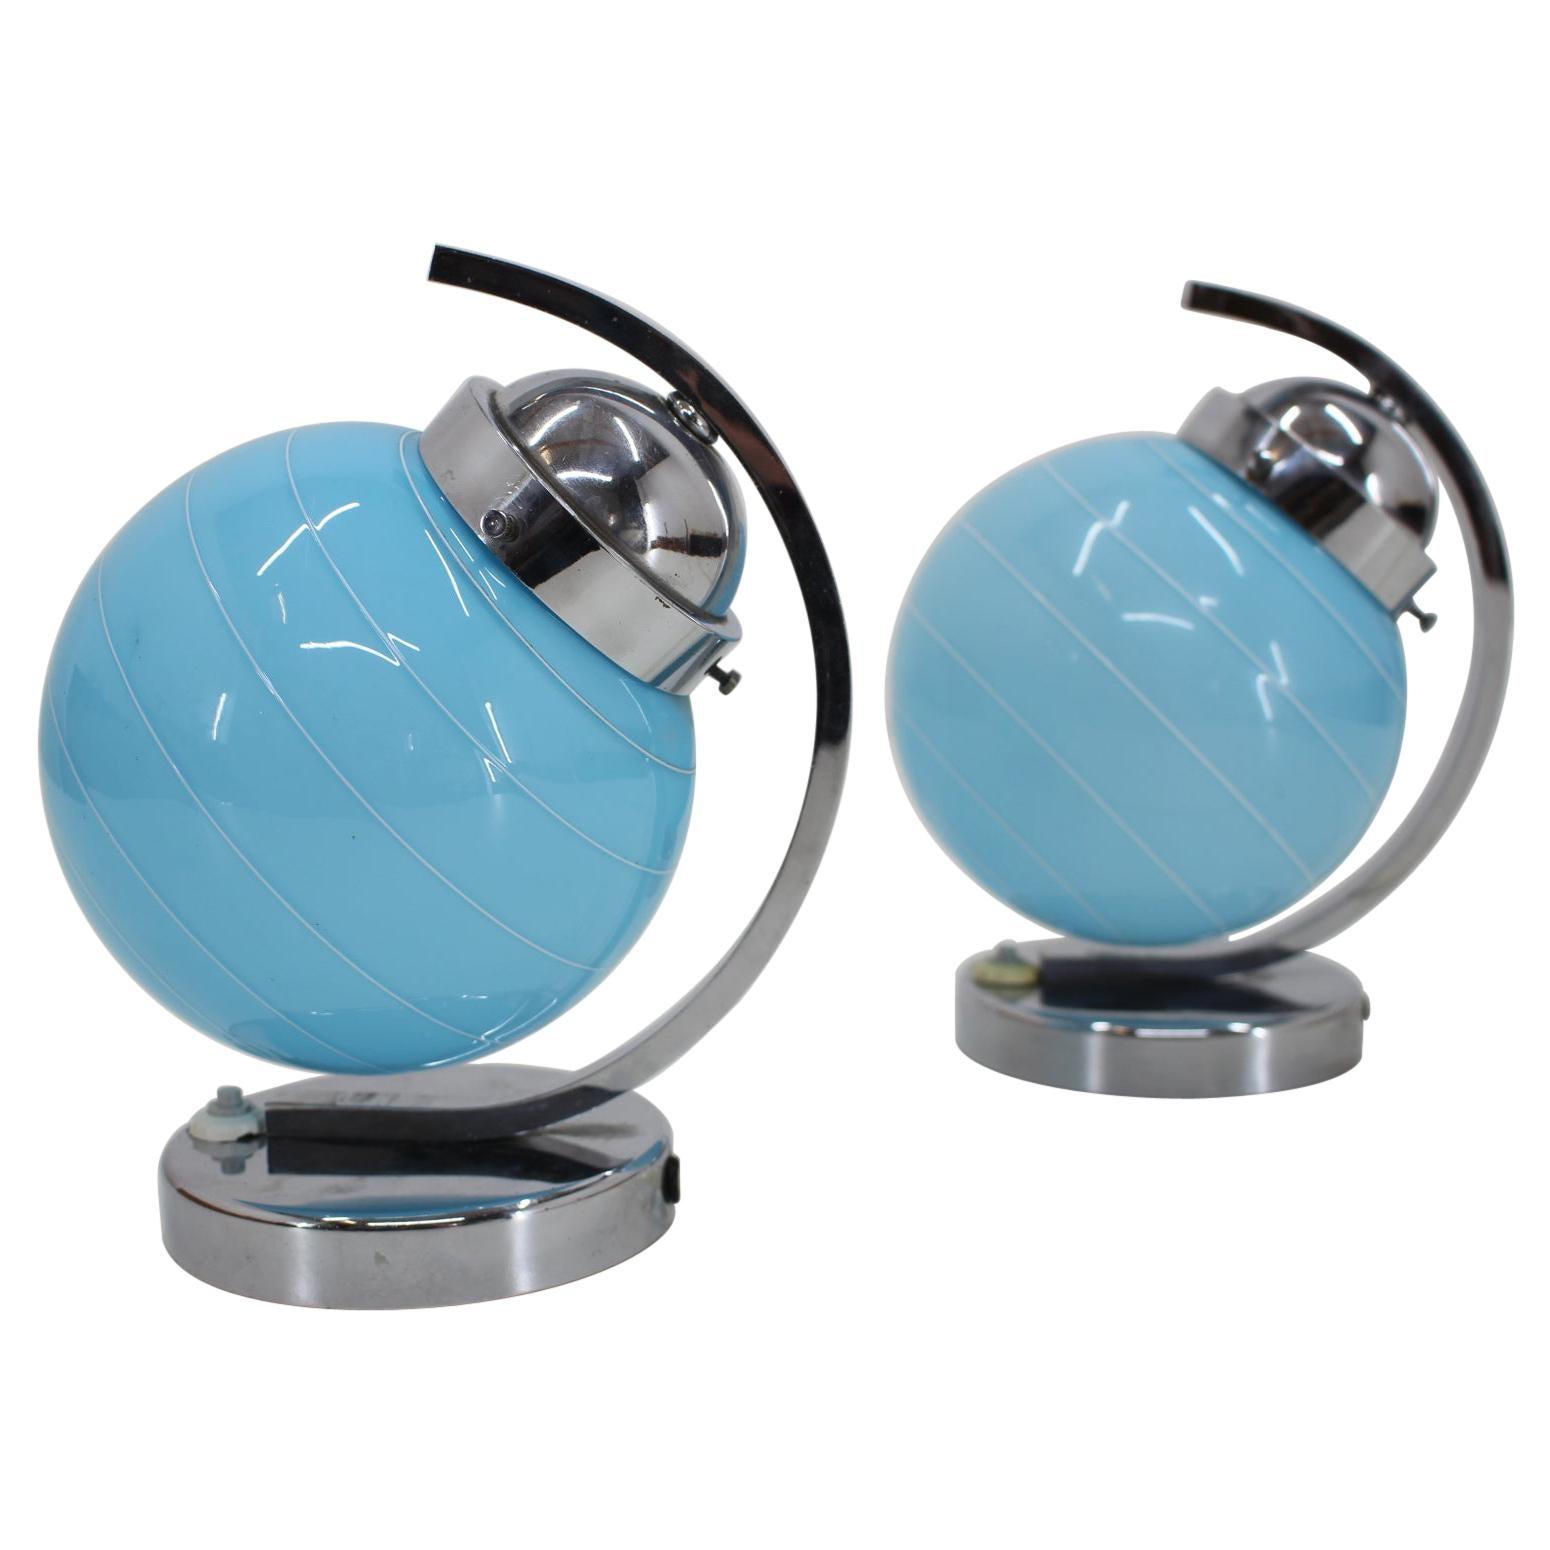 1930s Pair of Blue Bauhaus Table Lamps, Czechoslovakia